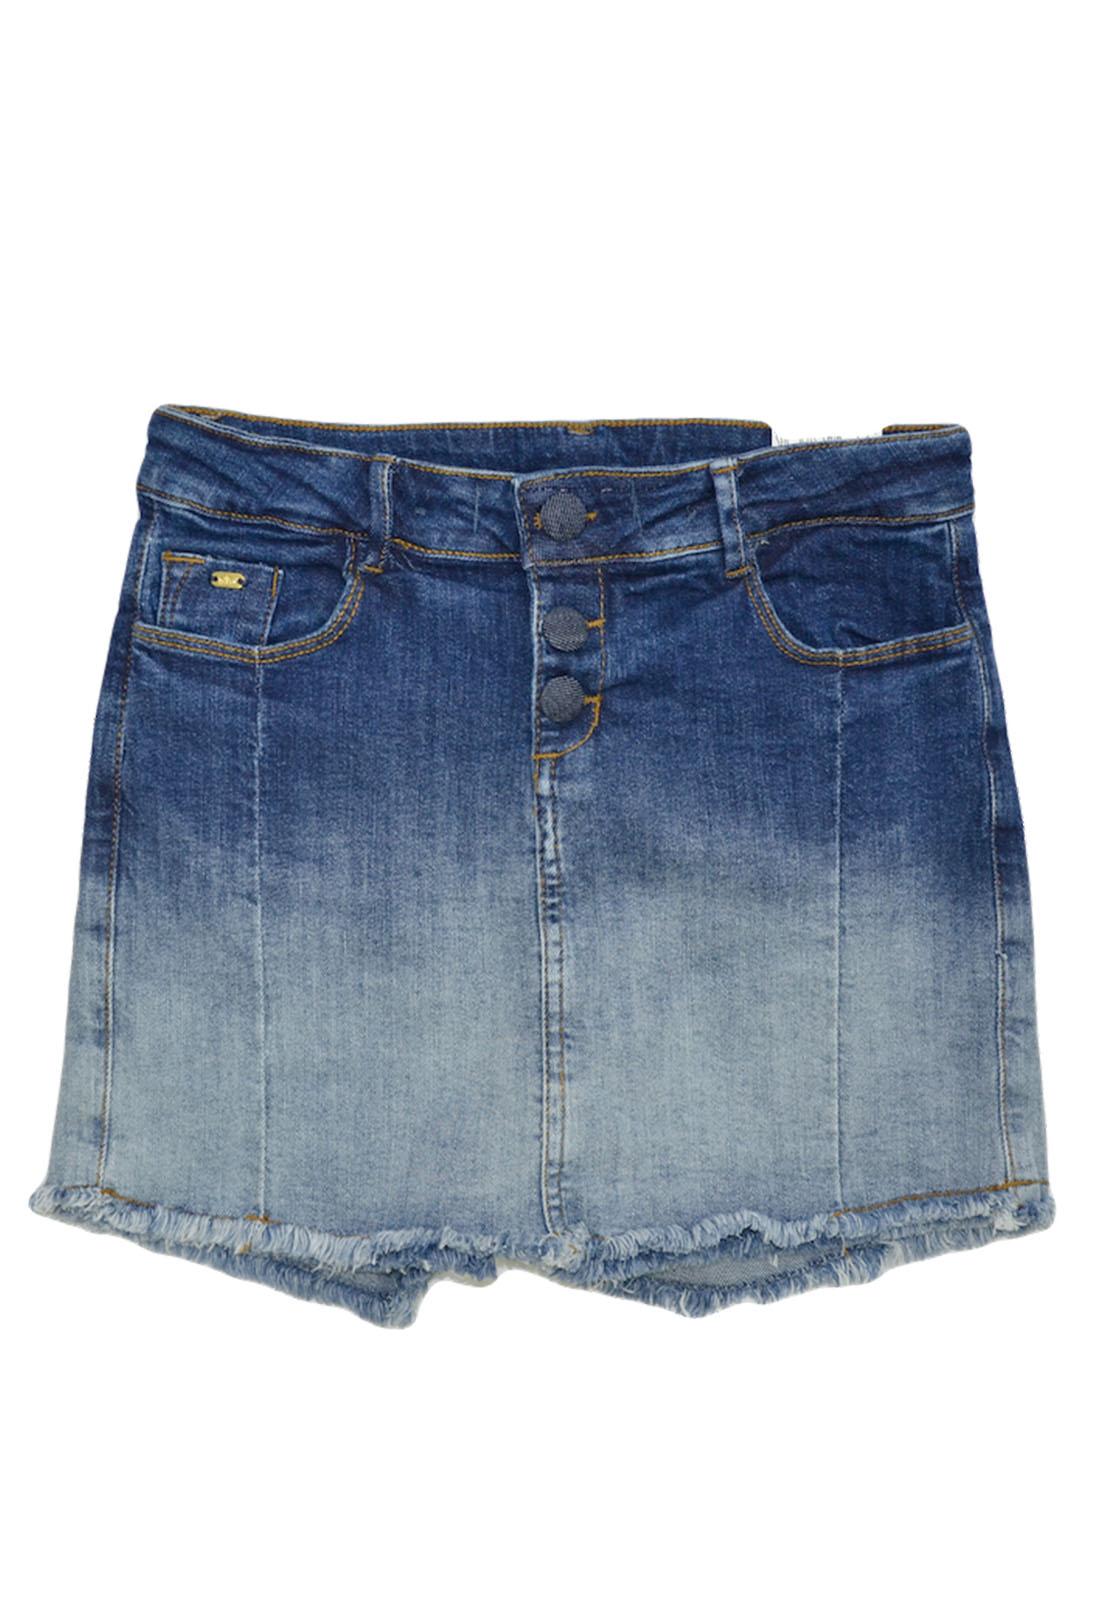 Short Saia Crawling Jeans